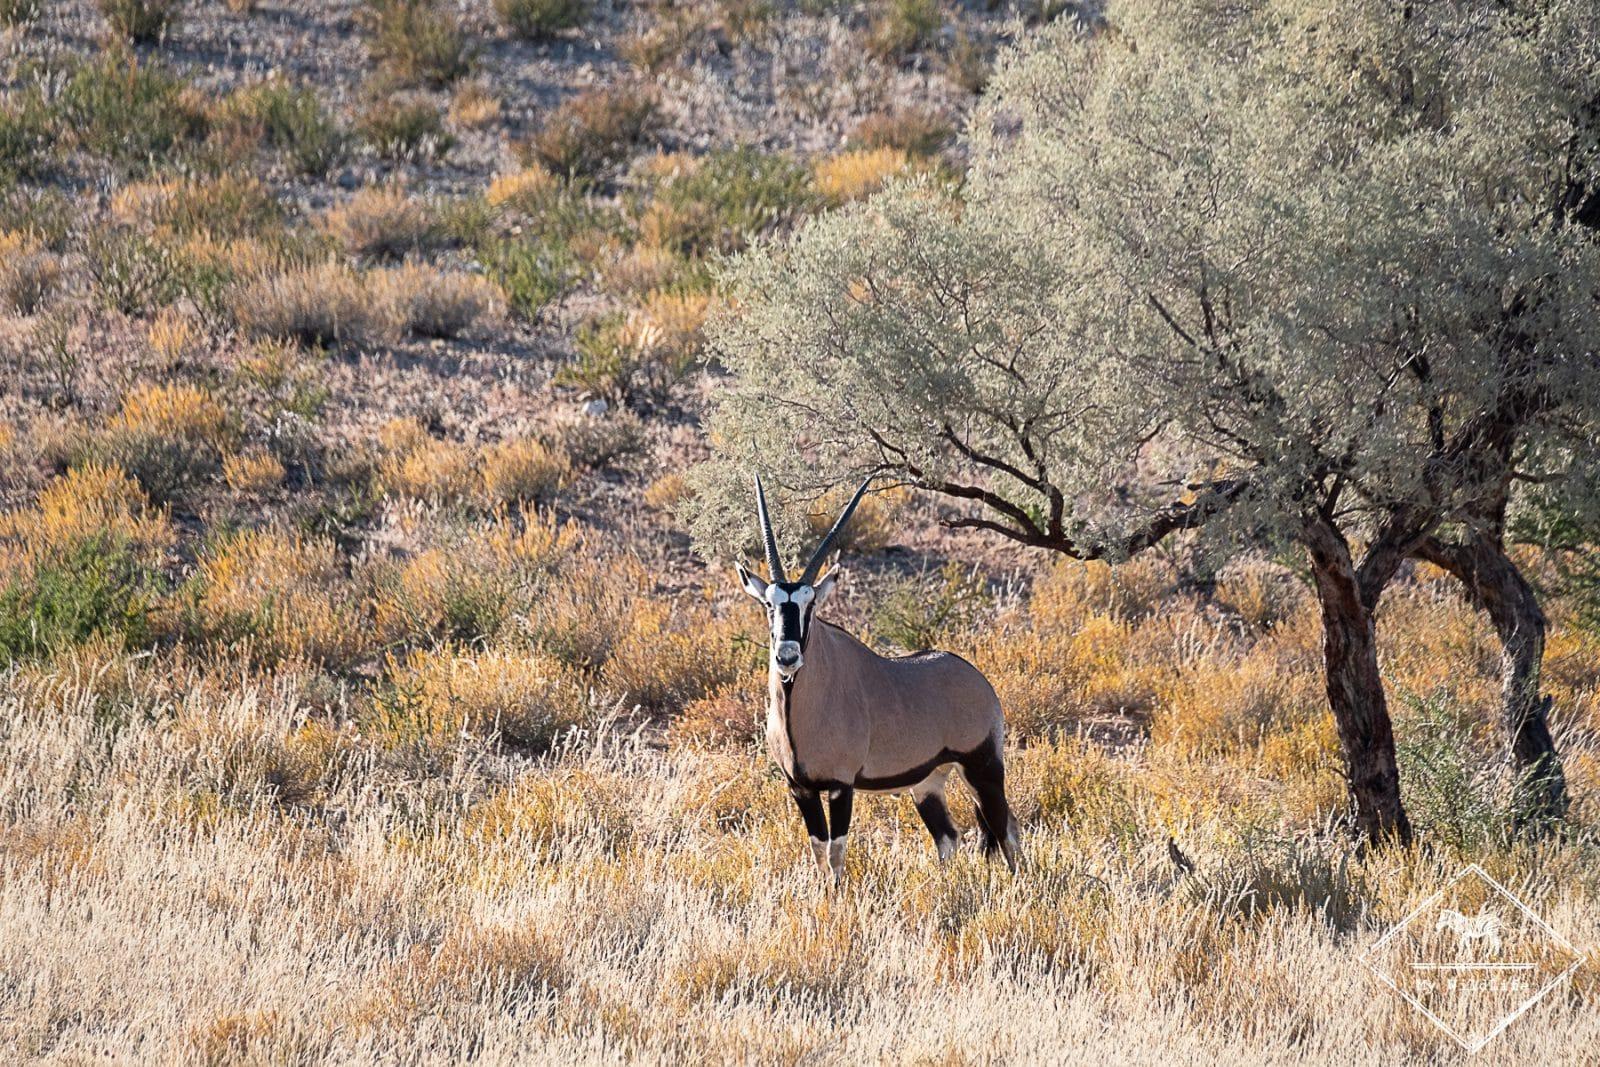 parc transfrontalier Kgalagadi - oryx